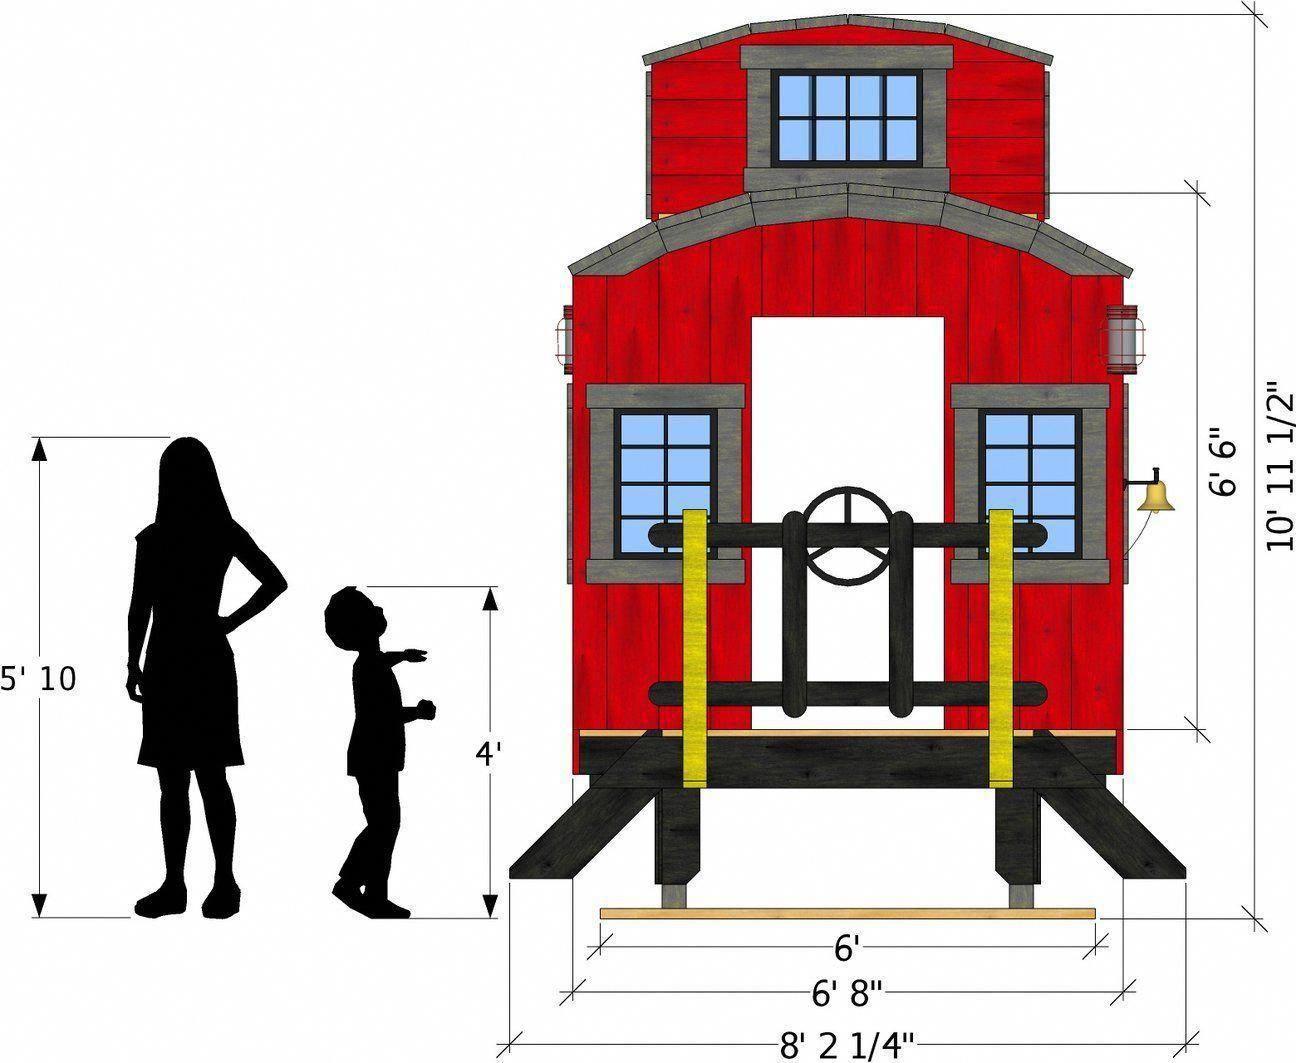 Front Isometric View Of Caboose Playhouse Plan Playhouseplans Playhousebuildingplans Buildplayhouse Play Houses Build A Playhouse Playset Plans Diy backyard train plans